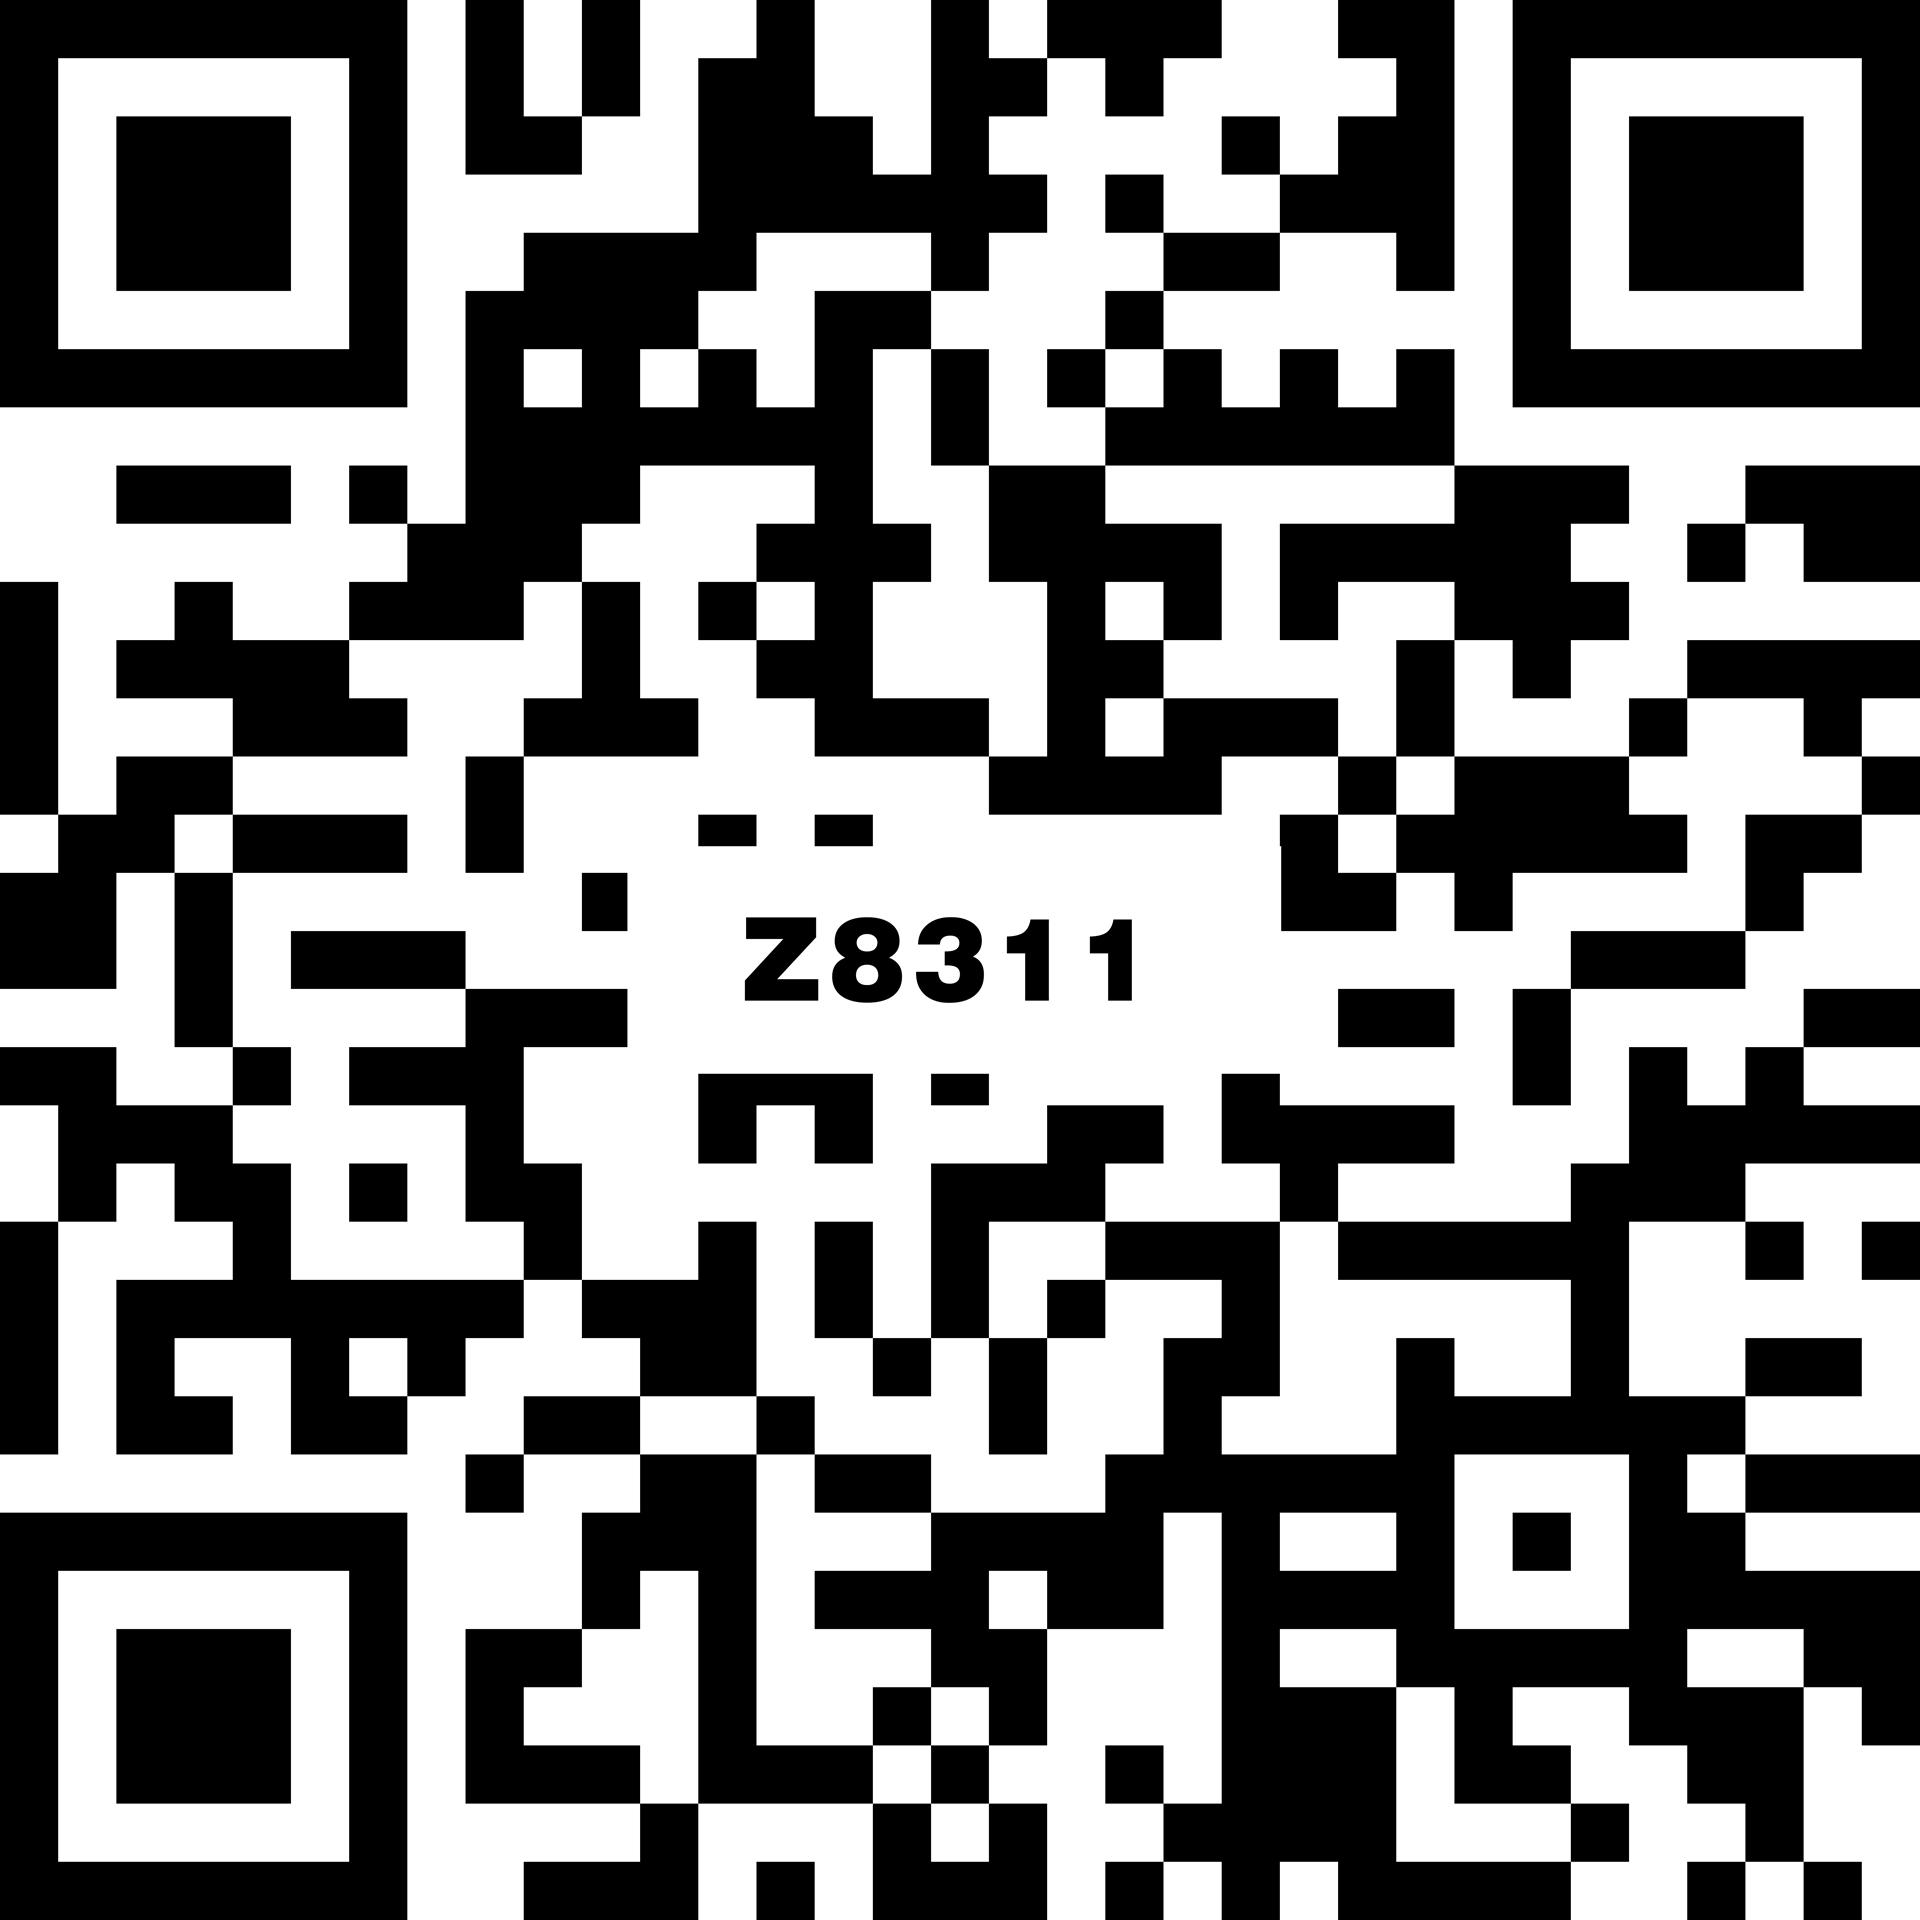 Z8311